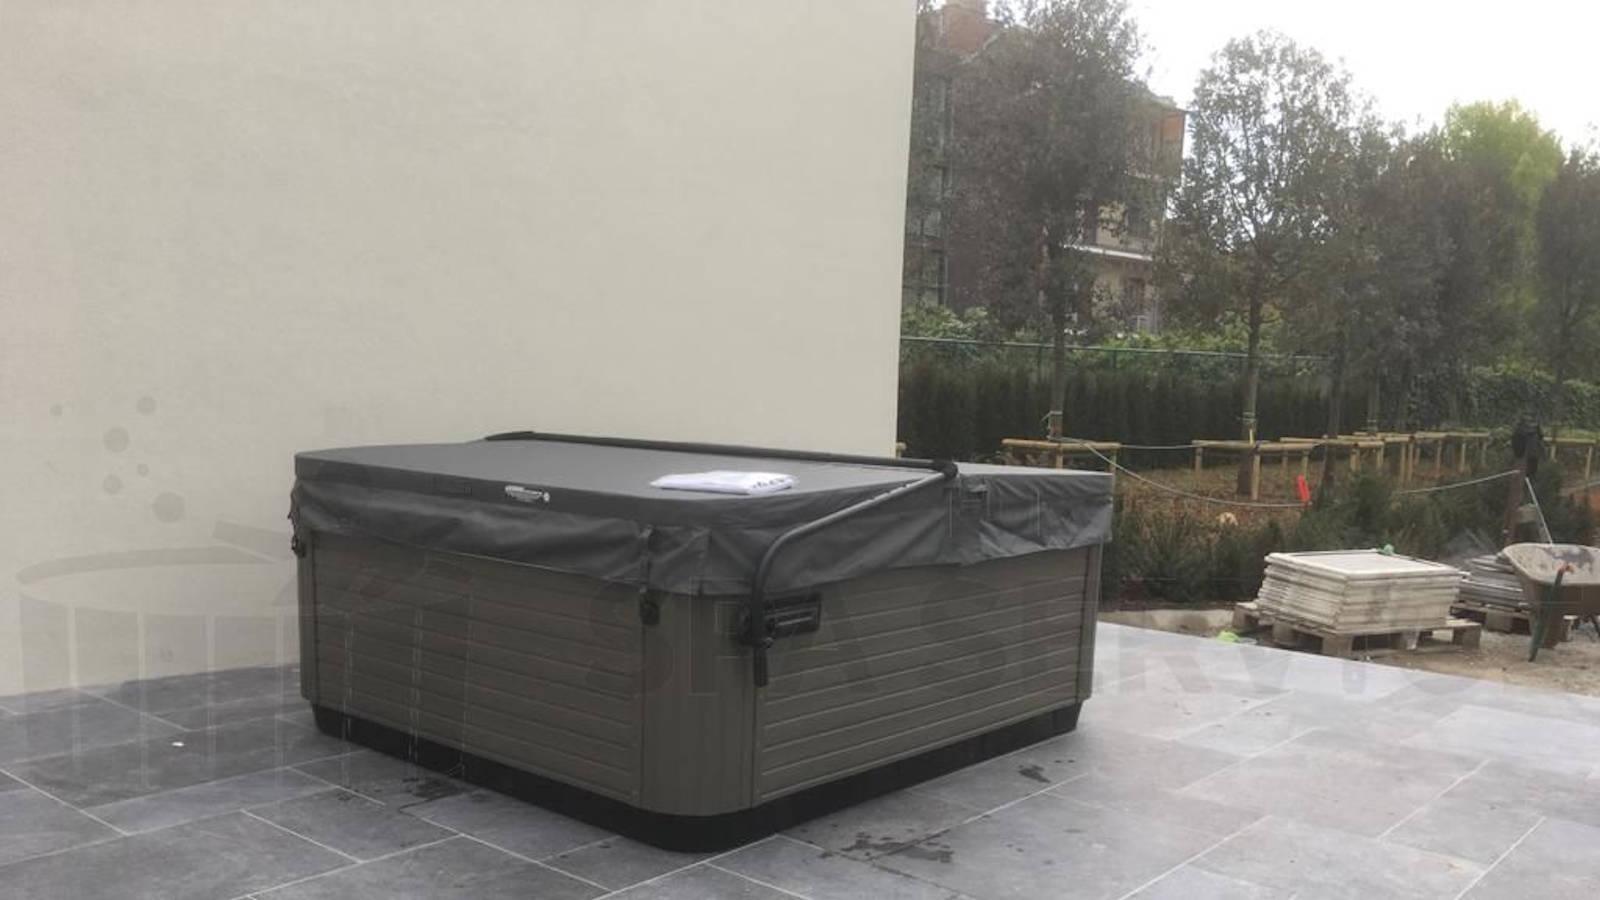 Plaatsing van een Villeroy & Boch X6L spa in Ronse België